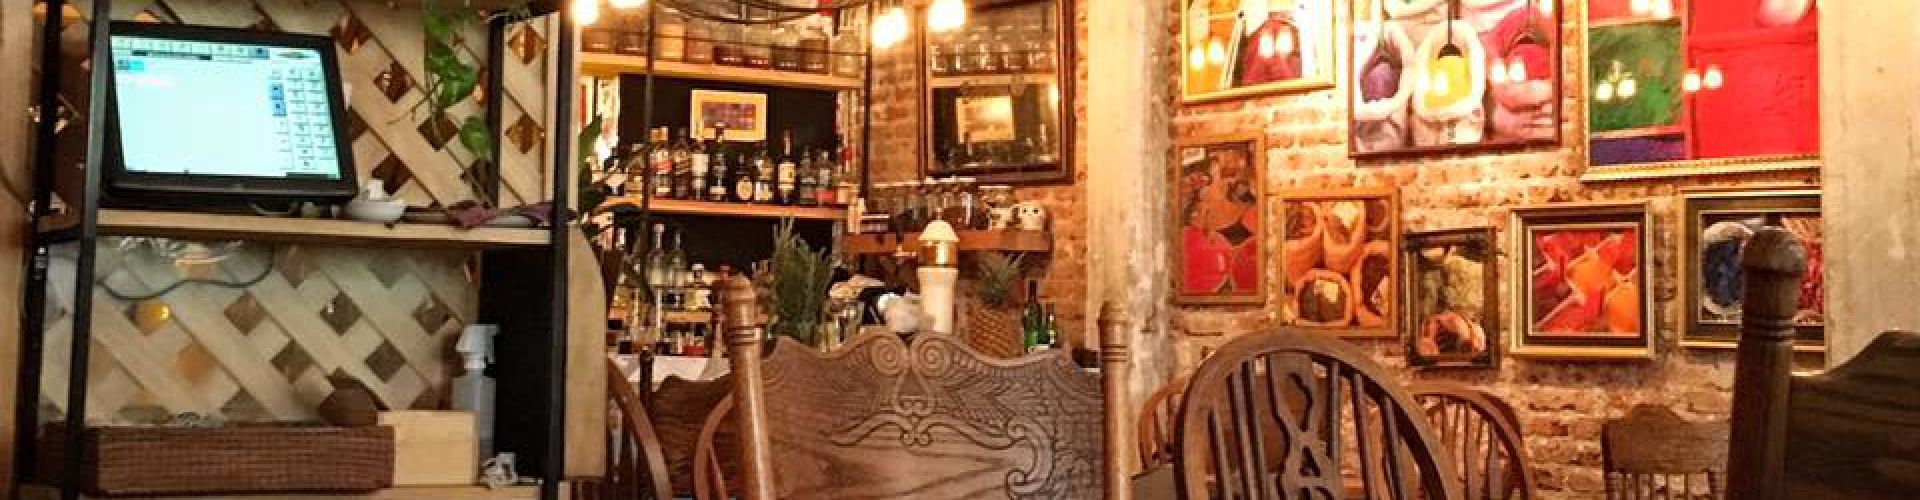 Paprika - Casual - Mexico City - Reviews - ellgeeBE